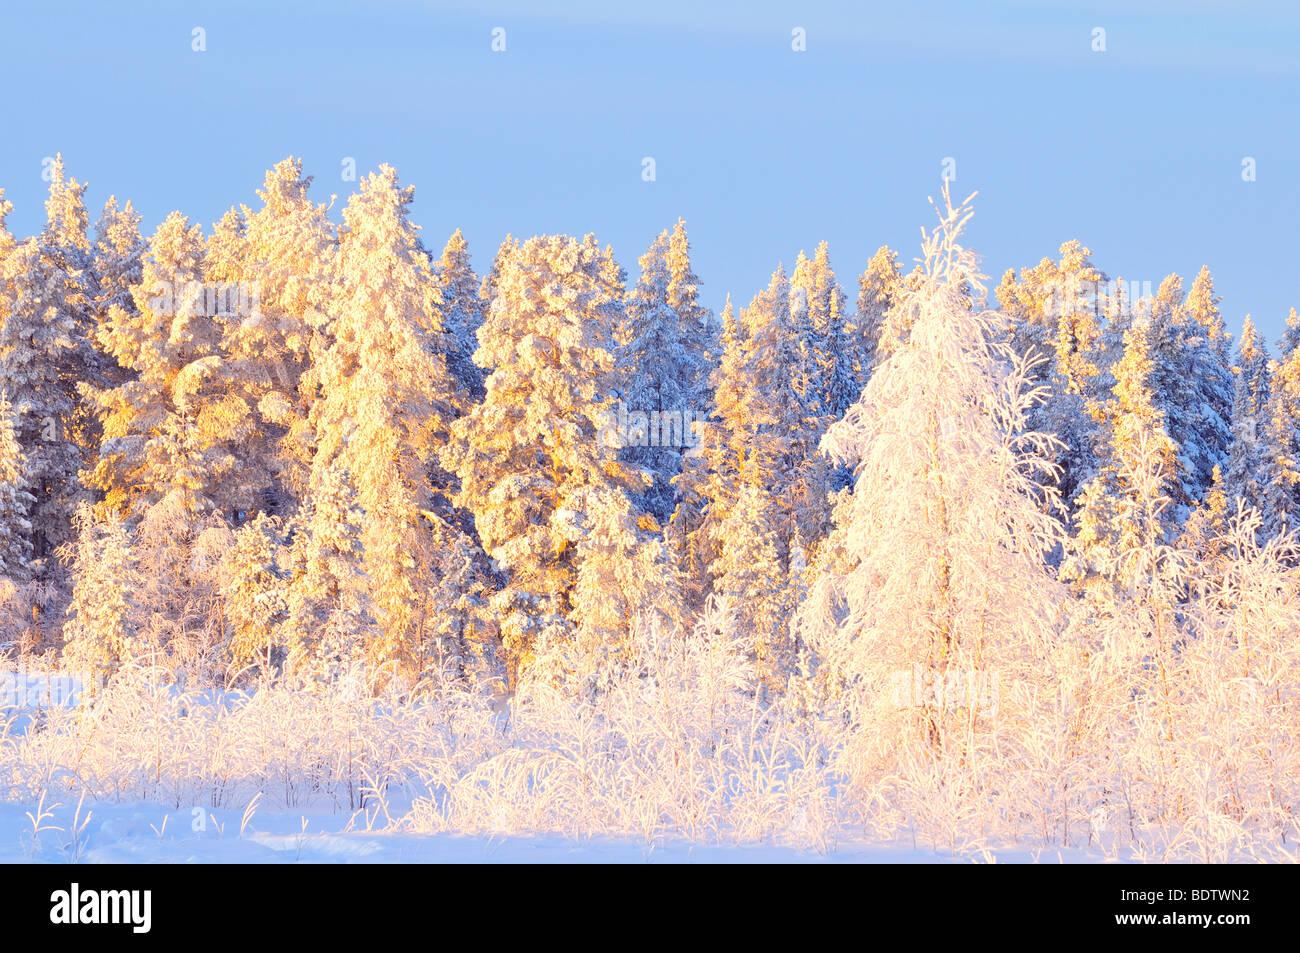 rauhreifueberzogene baeume, trees covered with frost, lapland, sweden - Stock Image